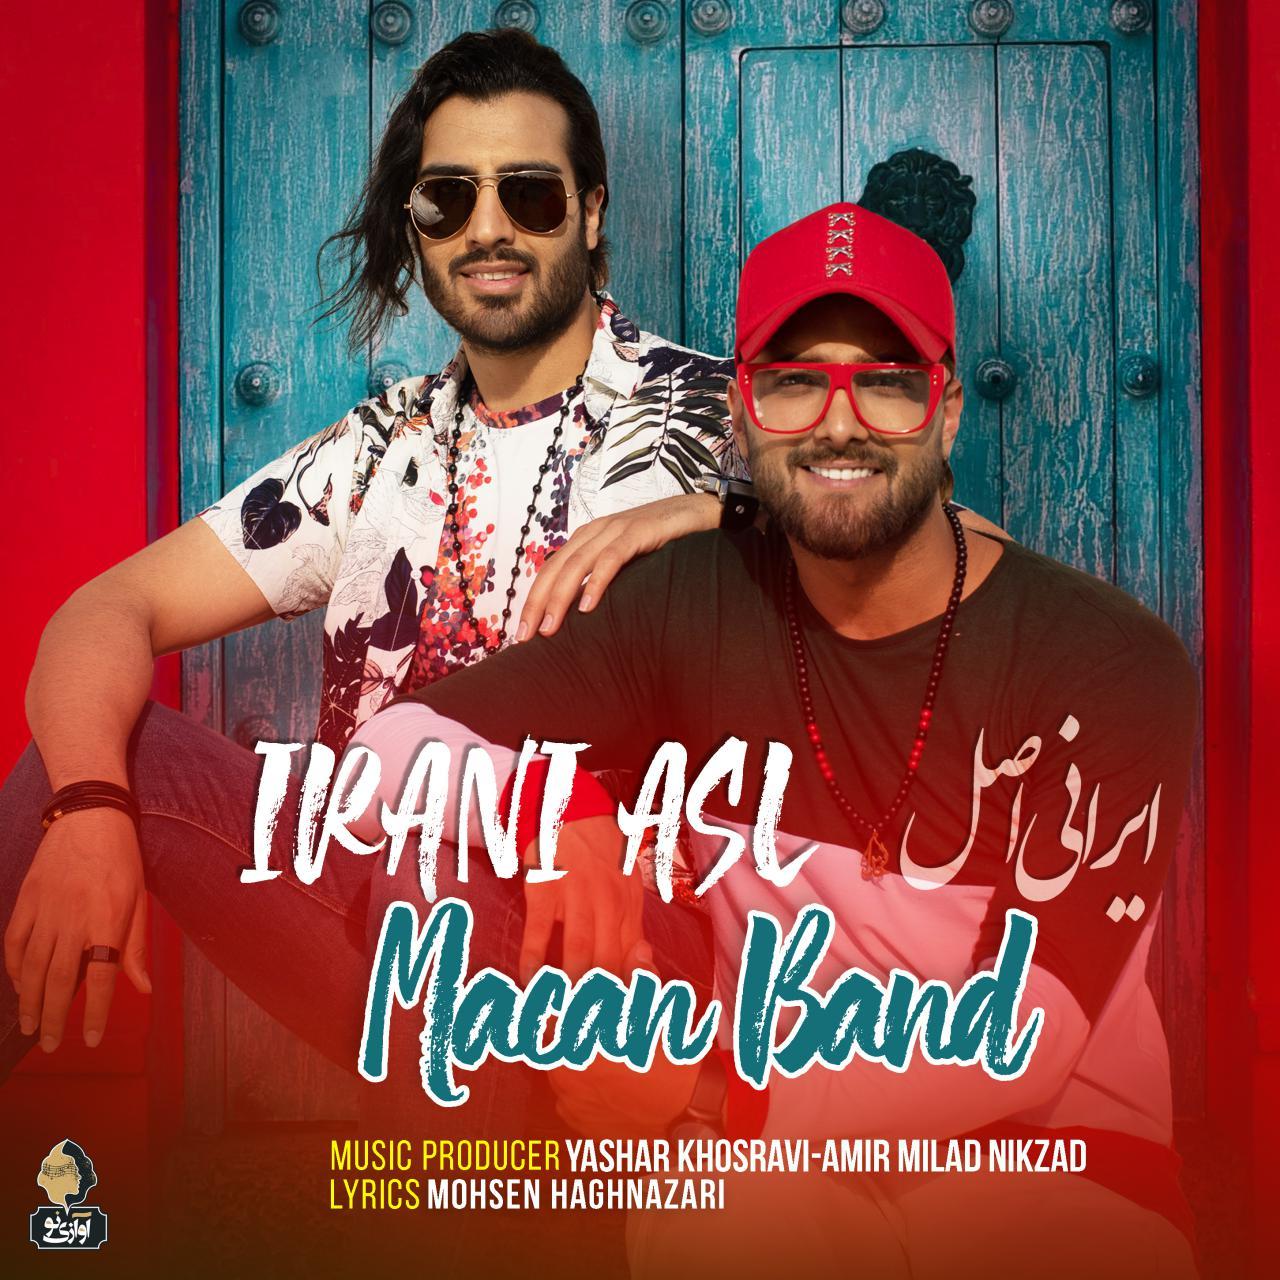 Macan Band – Irani Asl